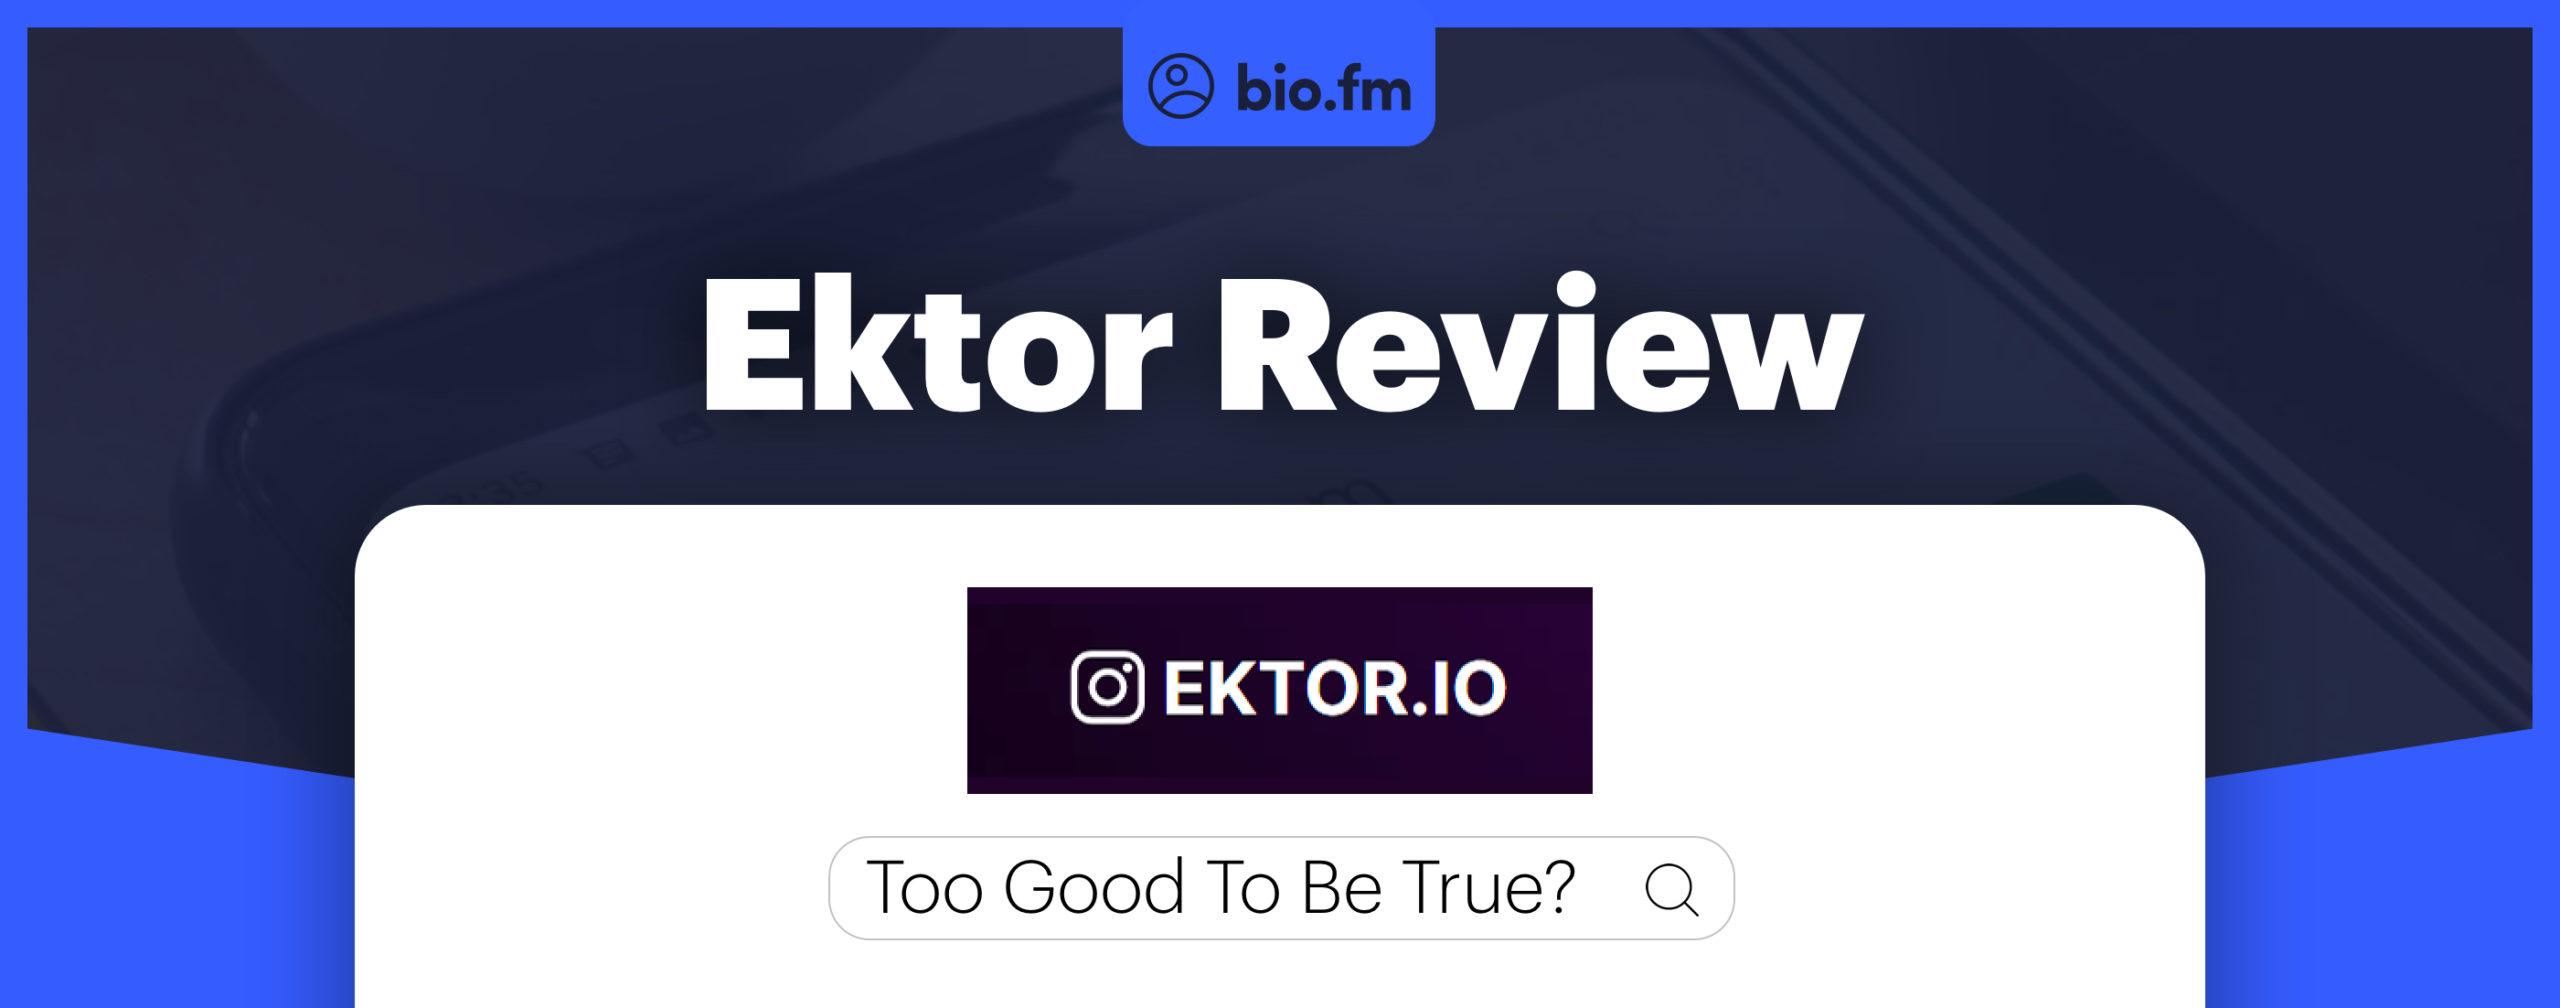 ektor featured image